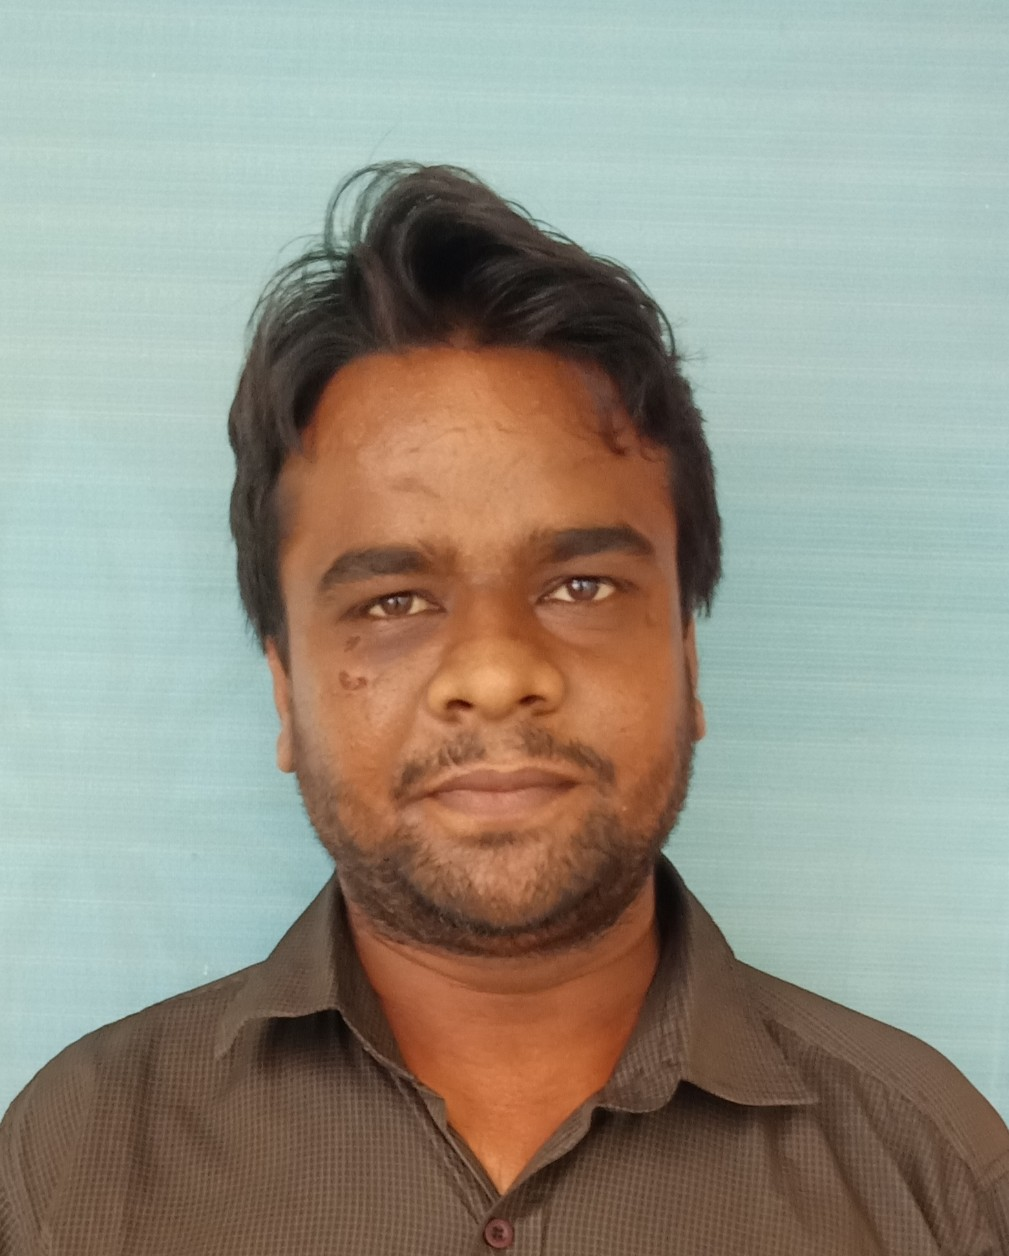 Sandeep Sathwara